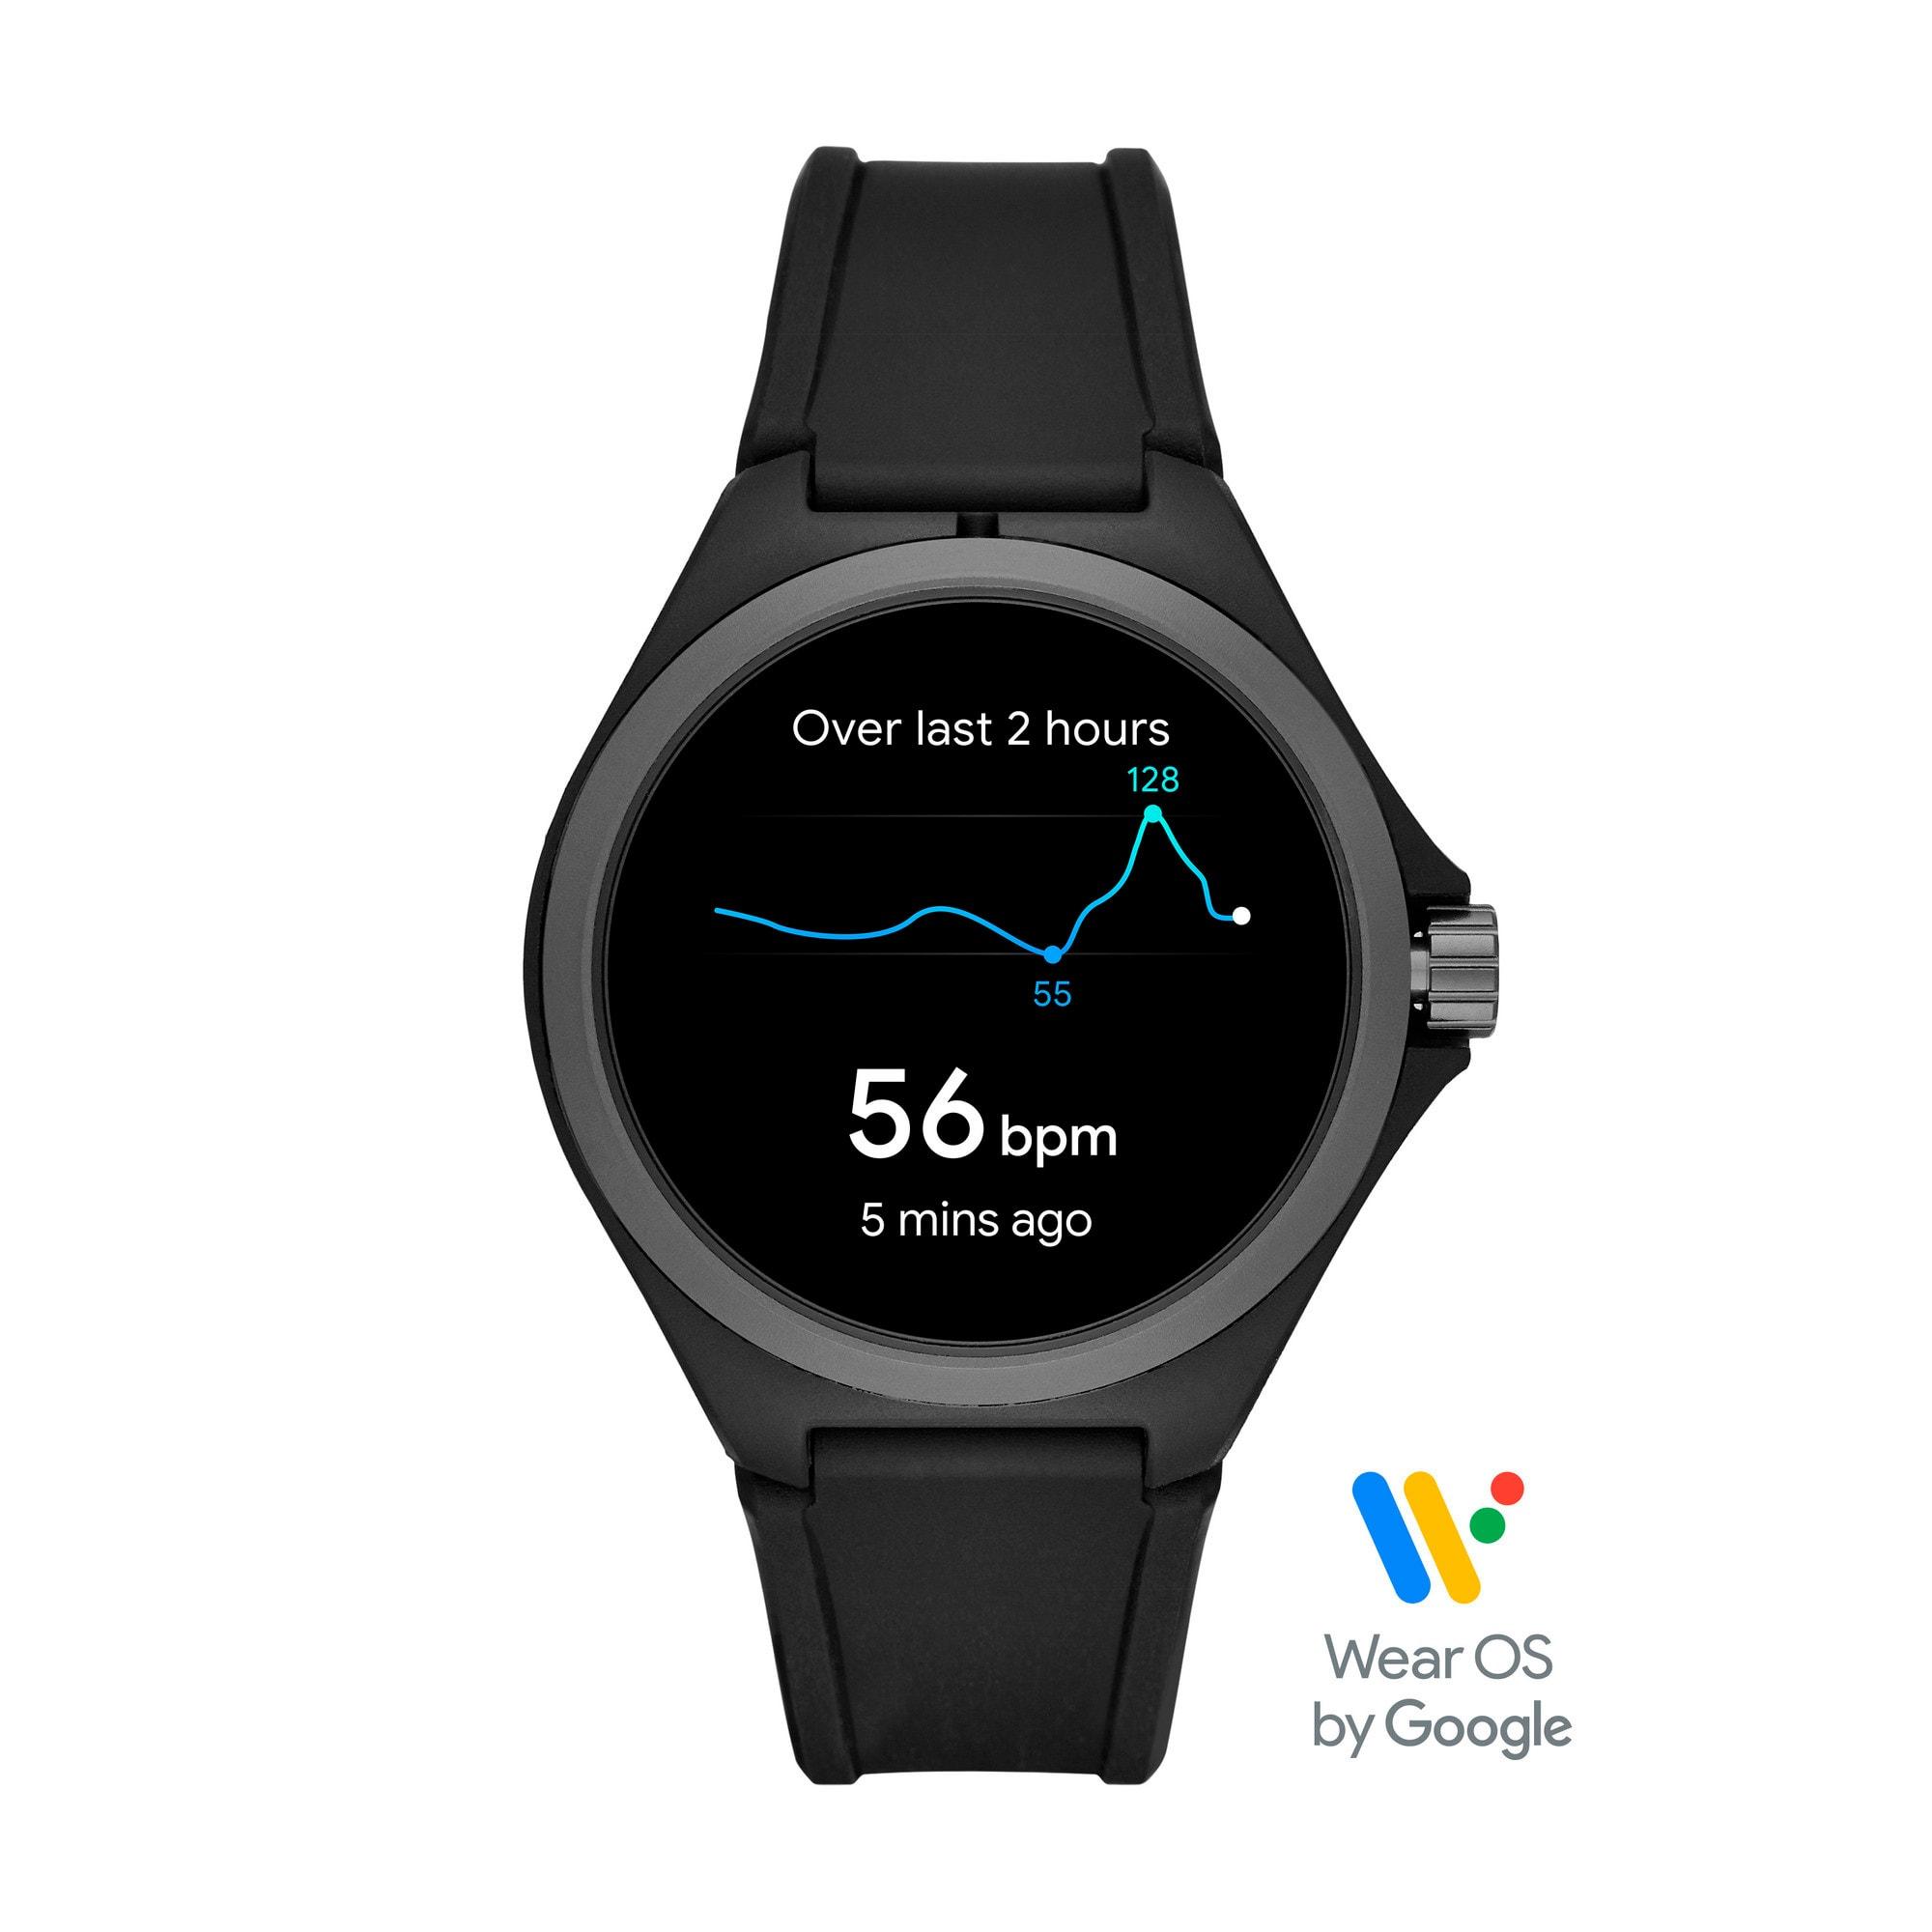 Thumbnail 5 of PUMA Smartwatch, Black/Gray, medium